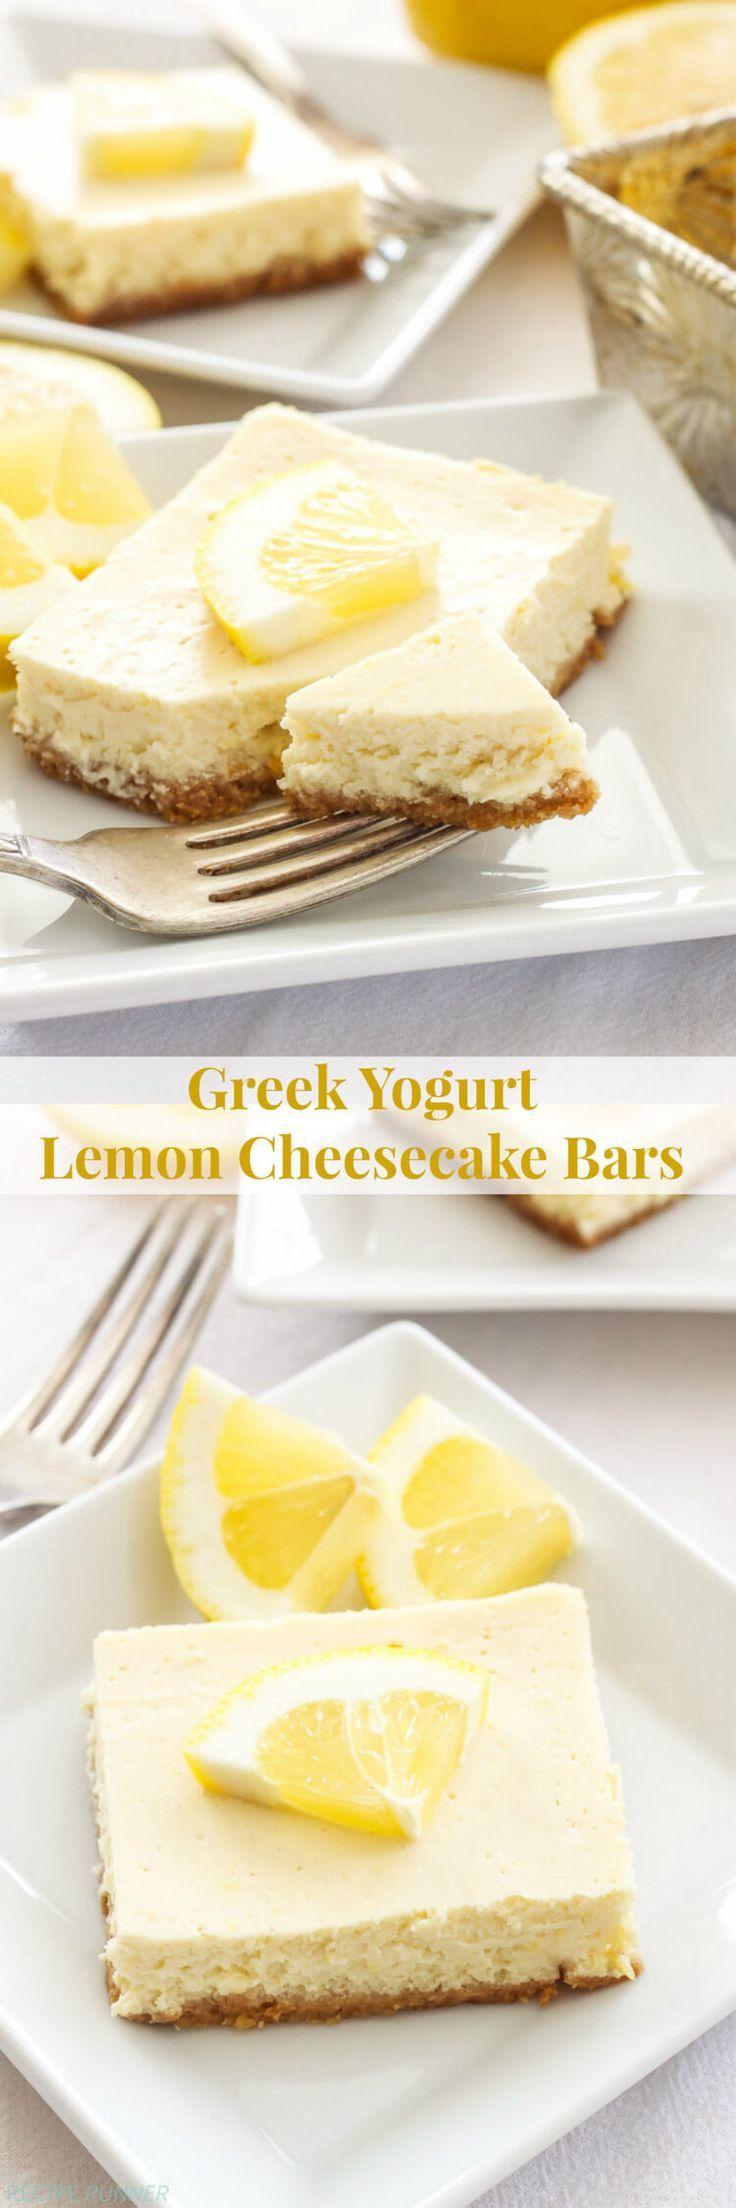 273 best images about lemon desserts on pinterest lemon for Healthy easy to make dessert recipes